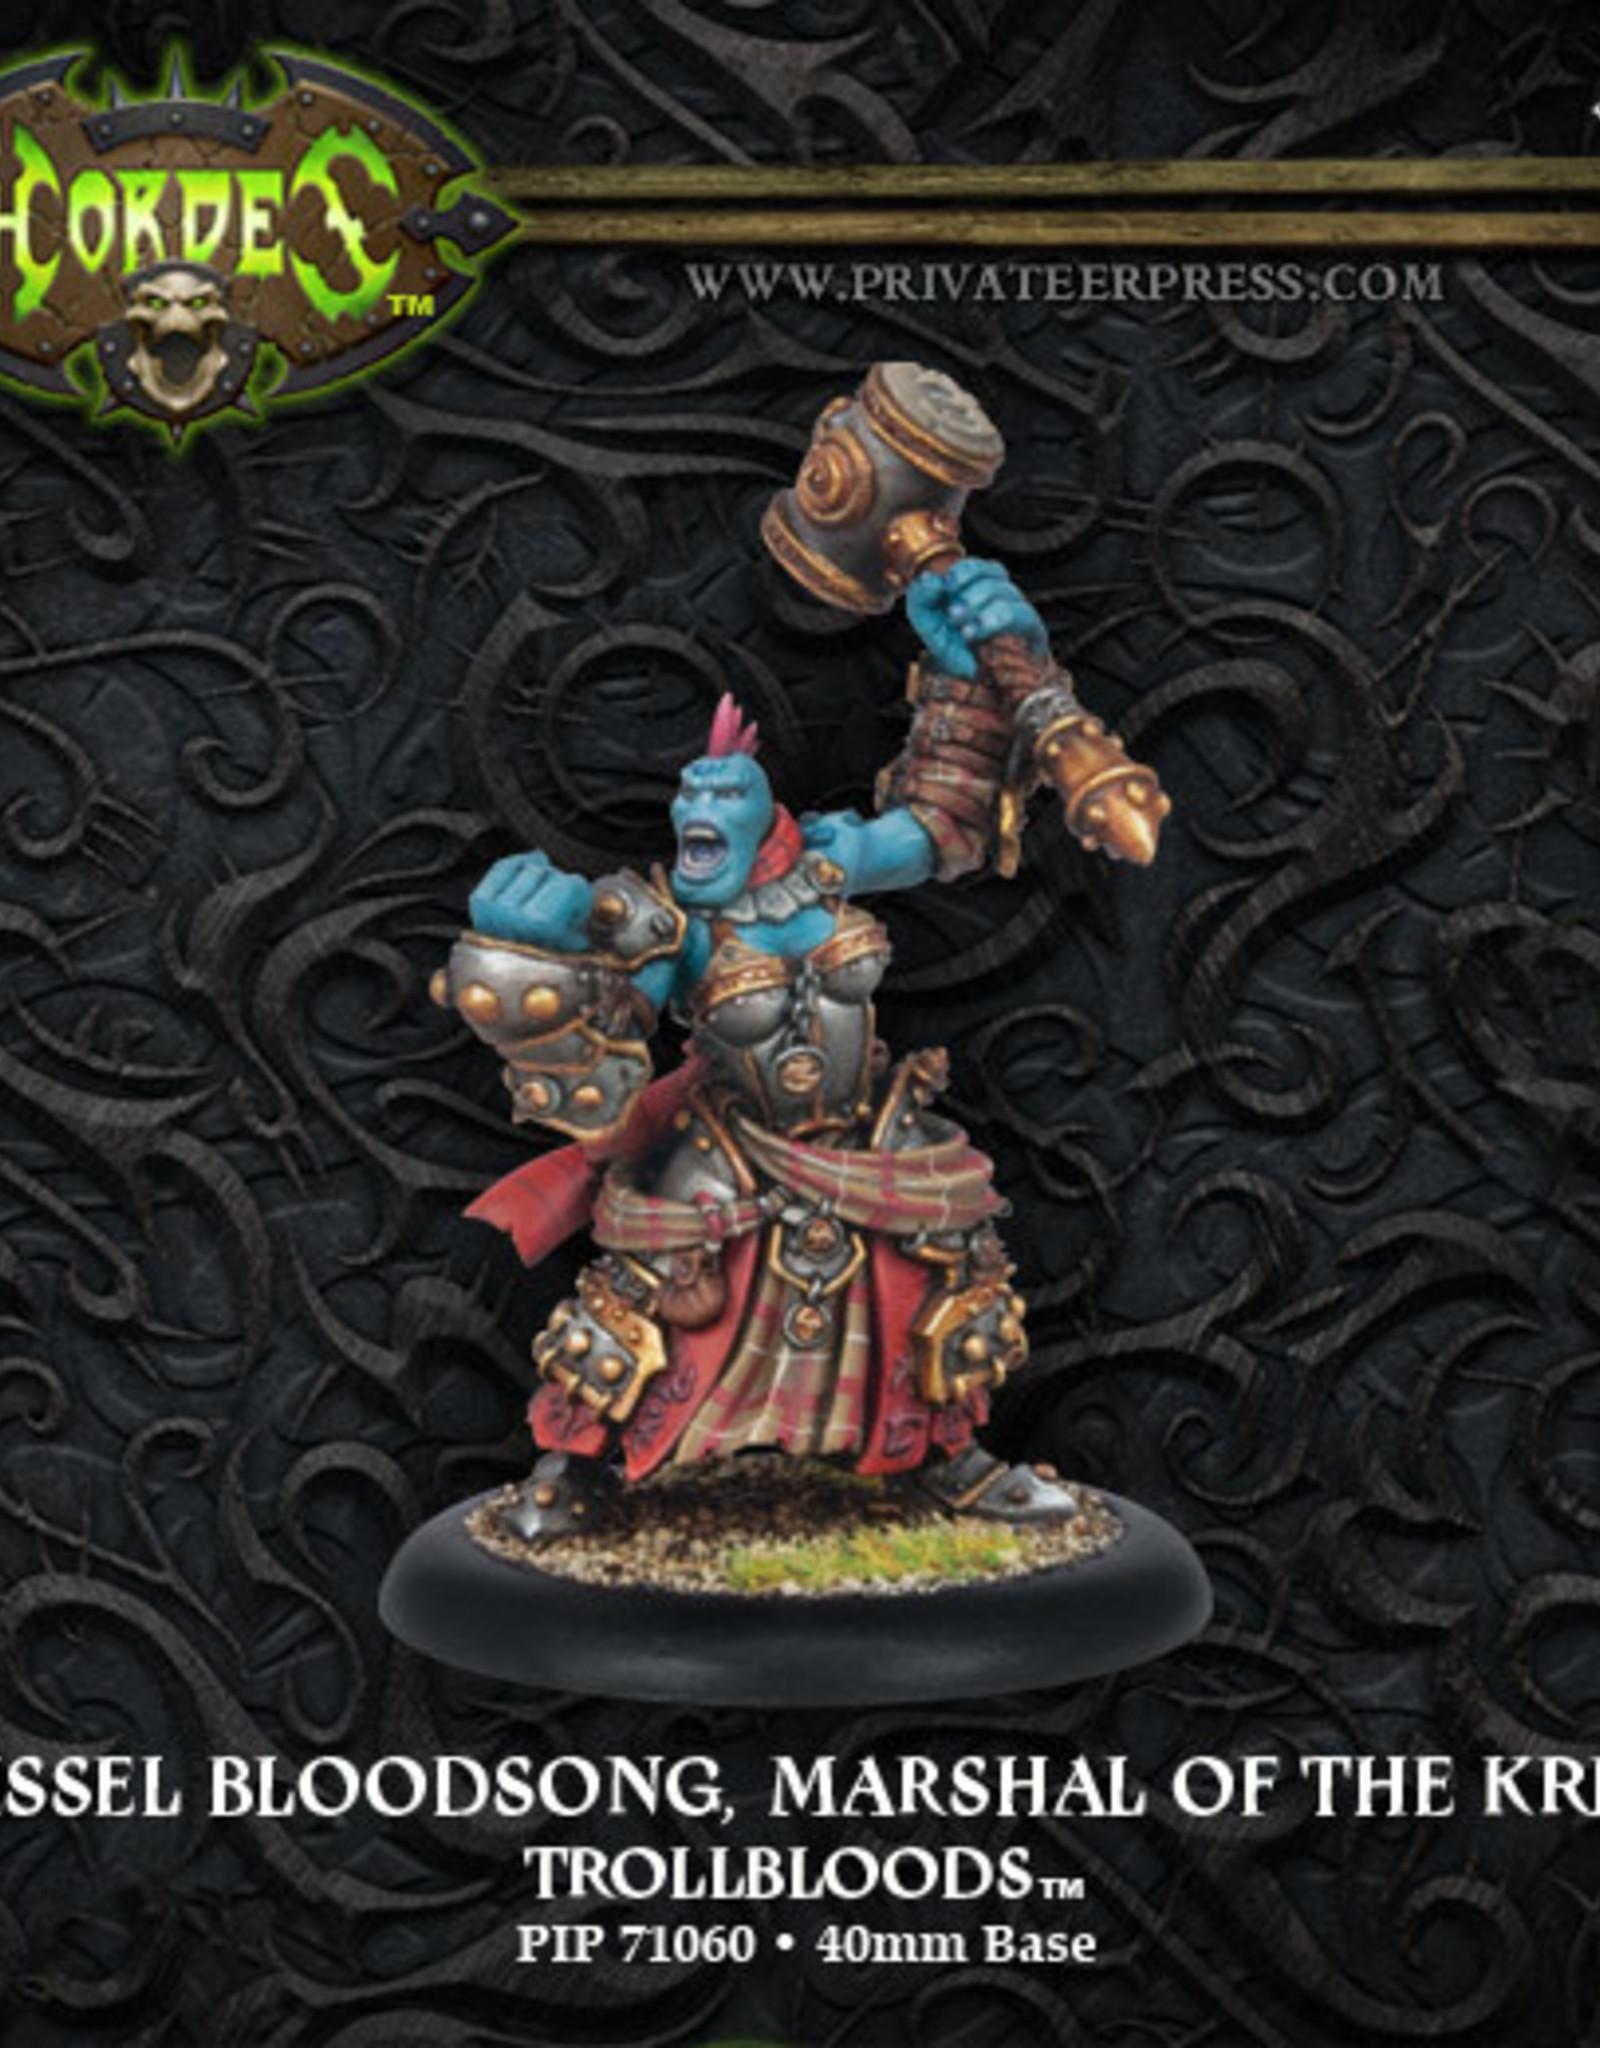 Hordes Trollbloods - Grissel Bloodsong Marshal of the Kriels